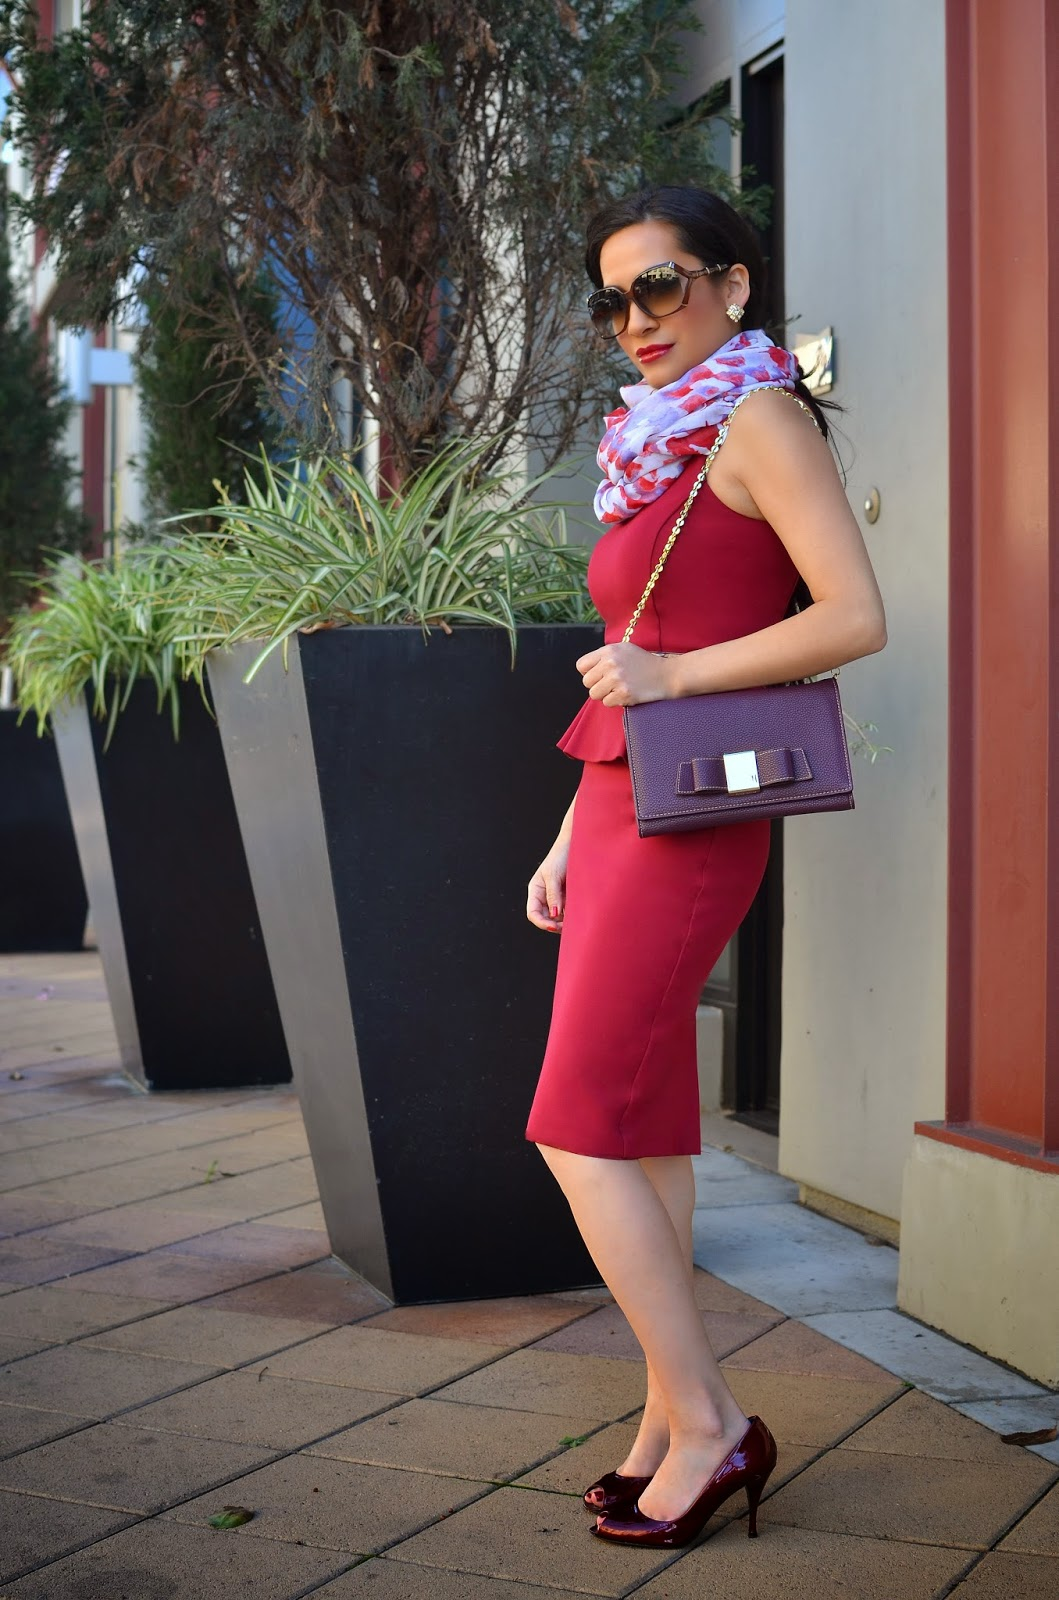 Armani Exchange Burgundy Peplum Dress Ivanka Trump Handbag Vera Wang Floral Scarf Maroon Stuart Weitzman Heels Gucci Suglasses